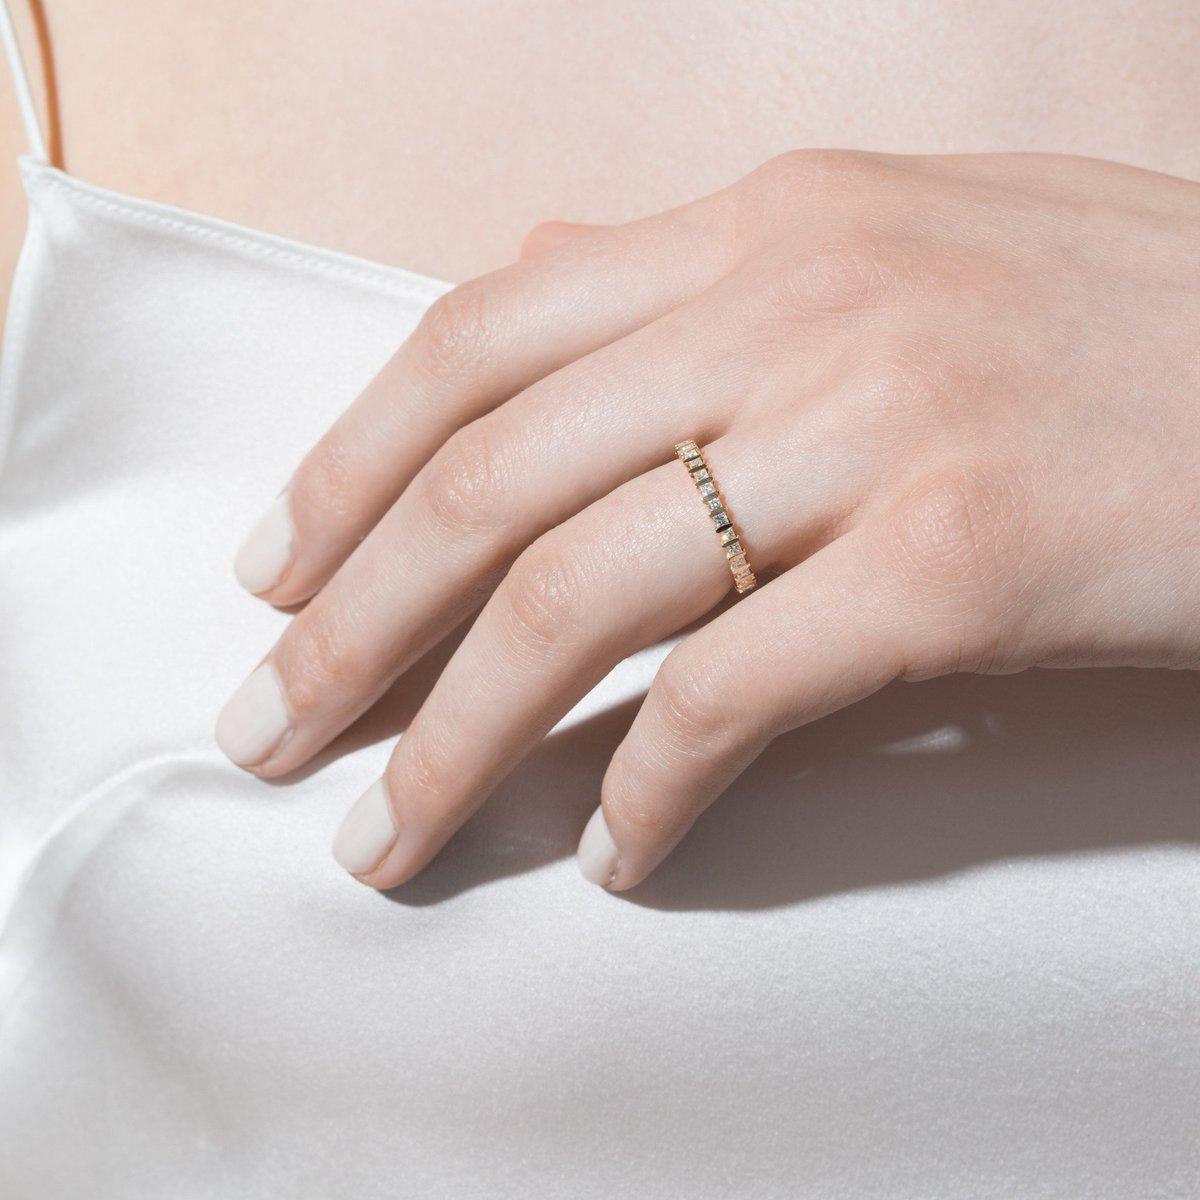 Shahla Karimi Freedom Ring | Garmentory